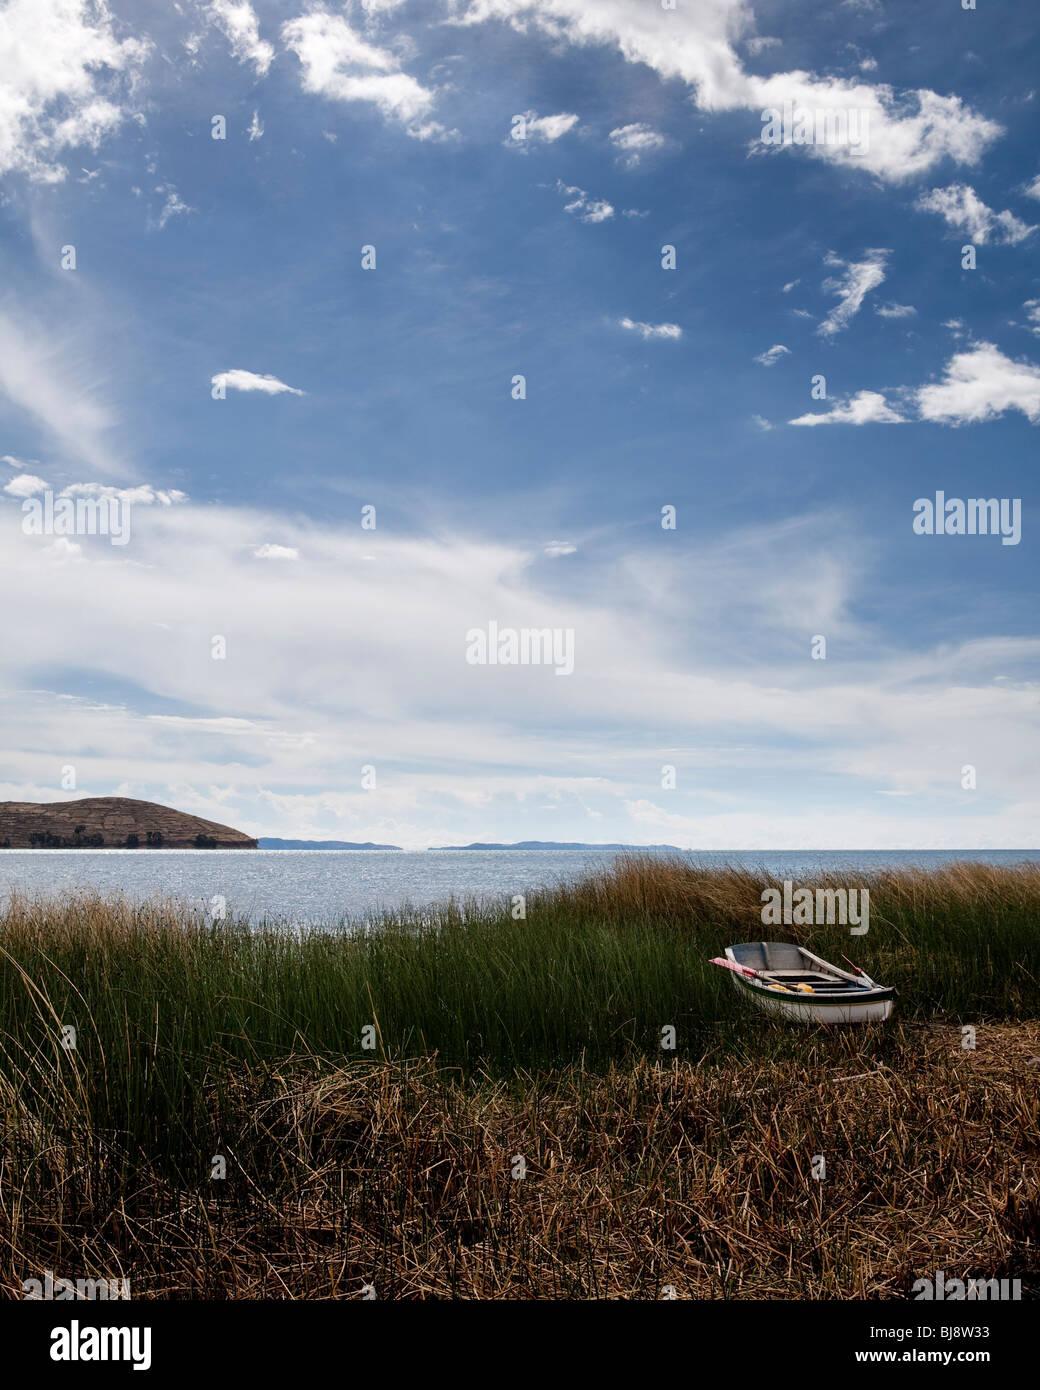 Boat by lake titikaka, bolivia, south america - Stock Image